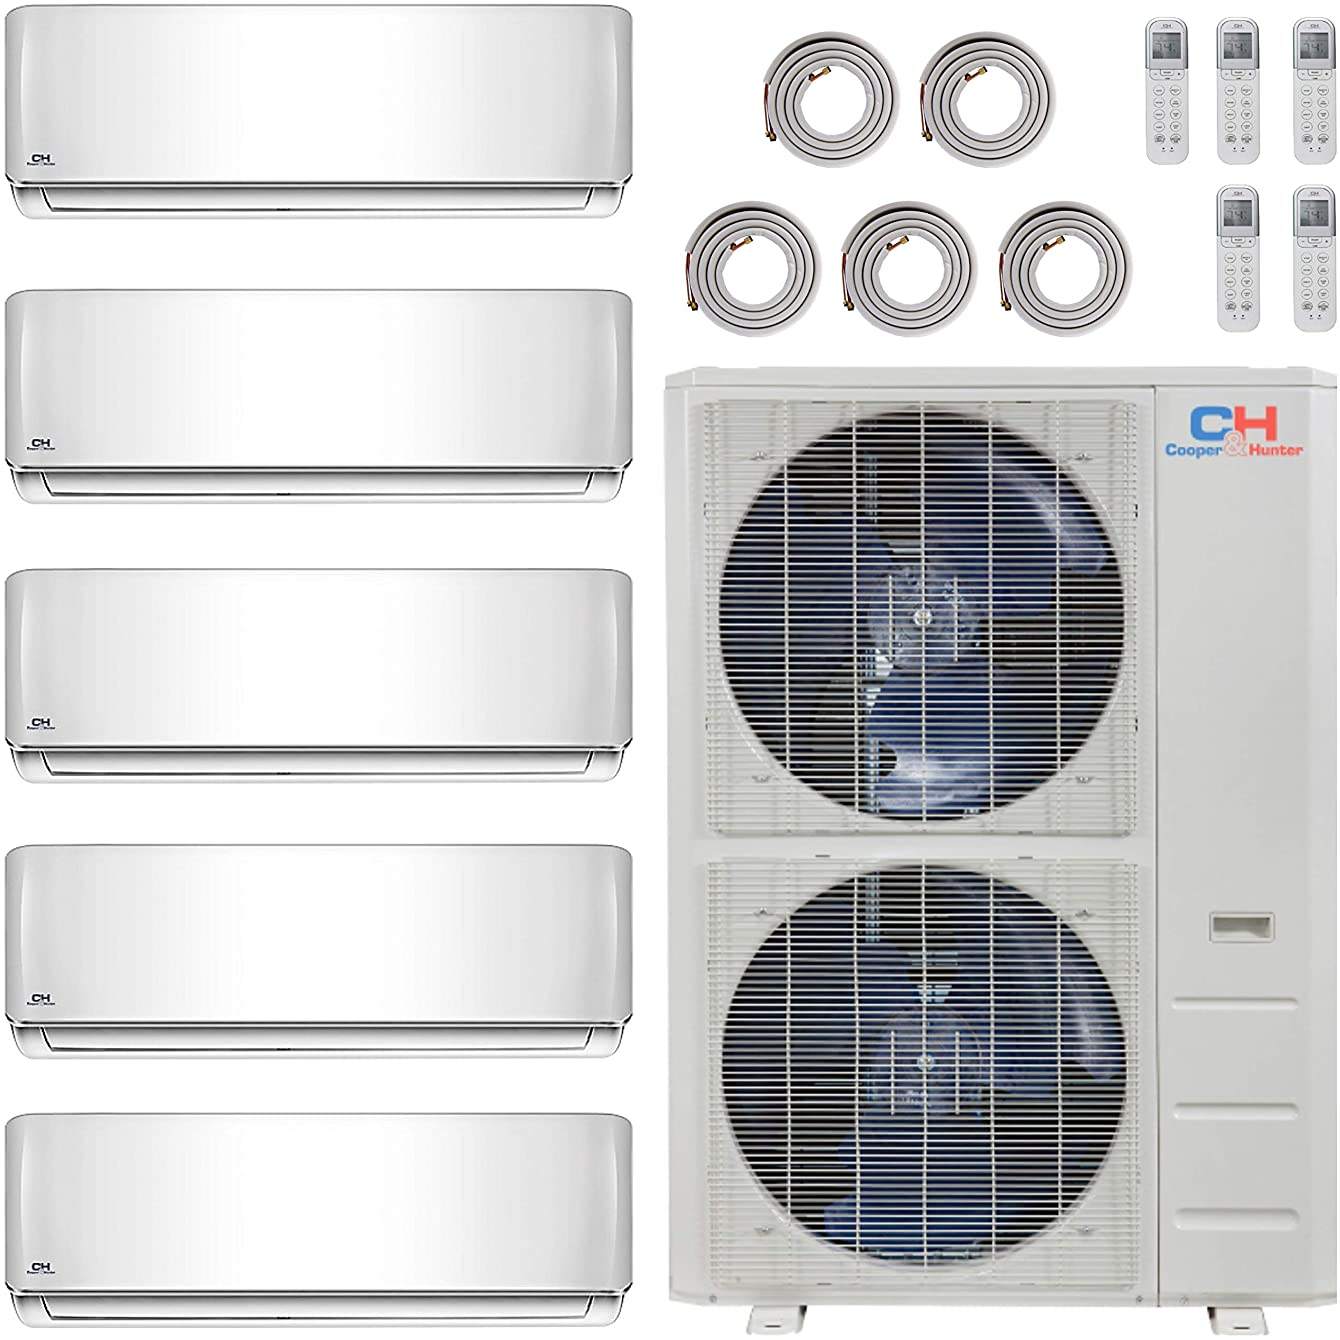 COOPER AND HUNTER Five 5 Zone Ductless Mini Split Air Conditioner Heat Pump 12000 12000 12000 12000 12000 Multi